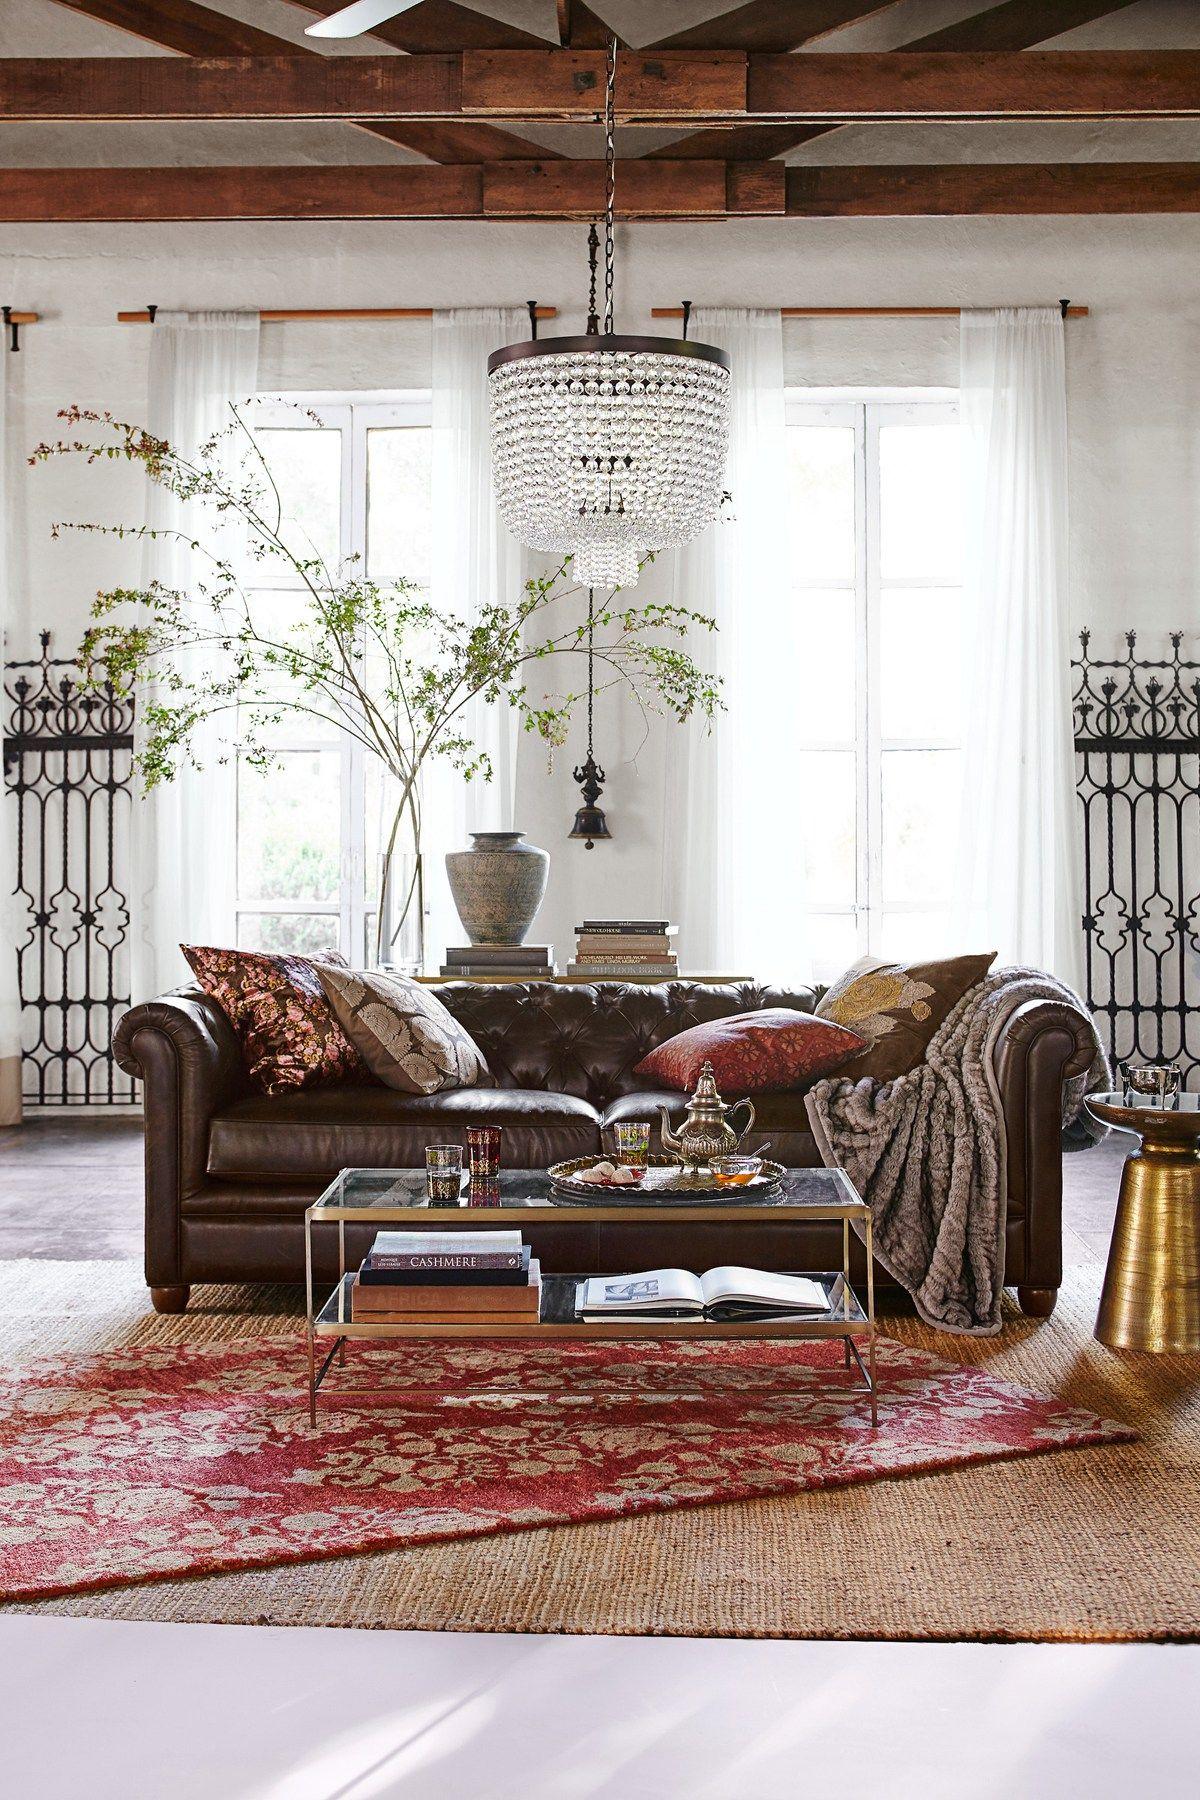 Bohemian Style Decorating Design Tips Where To Buy Boho Decor